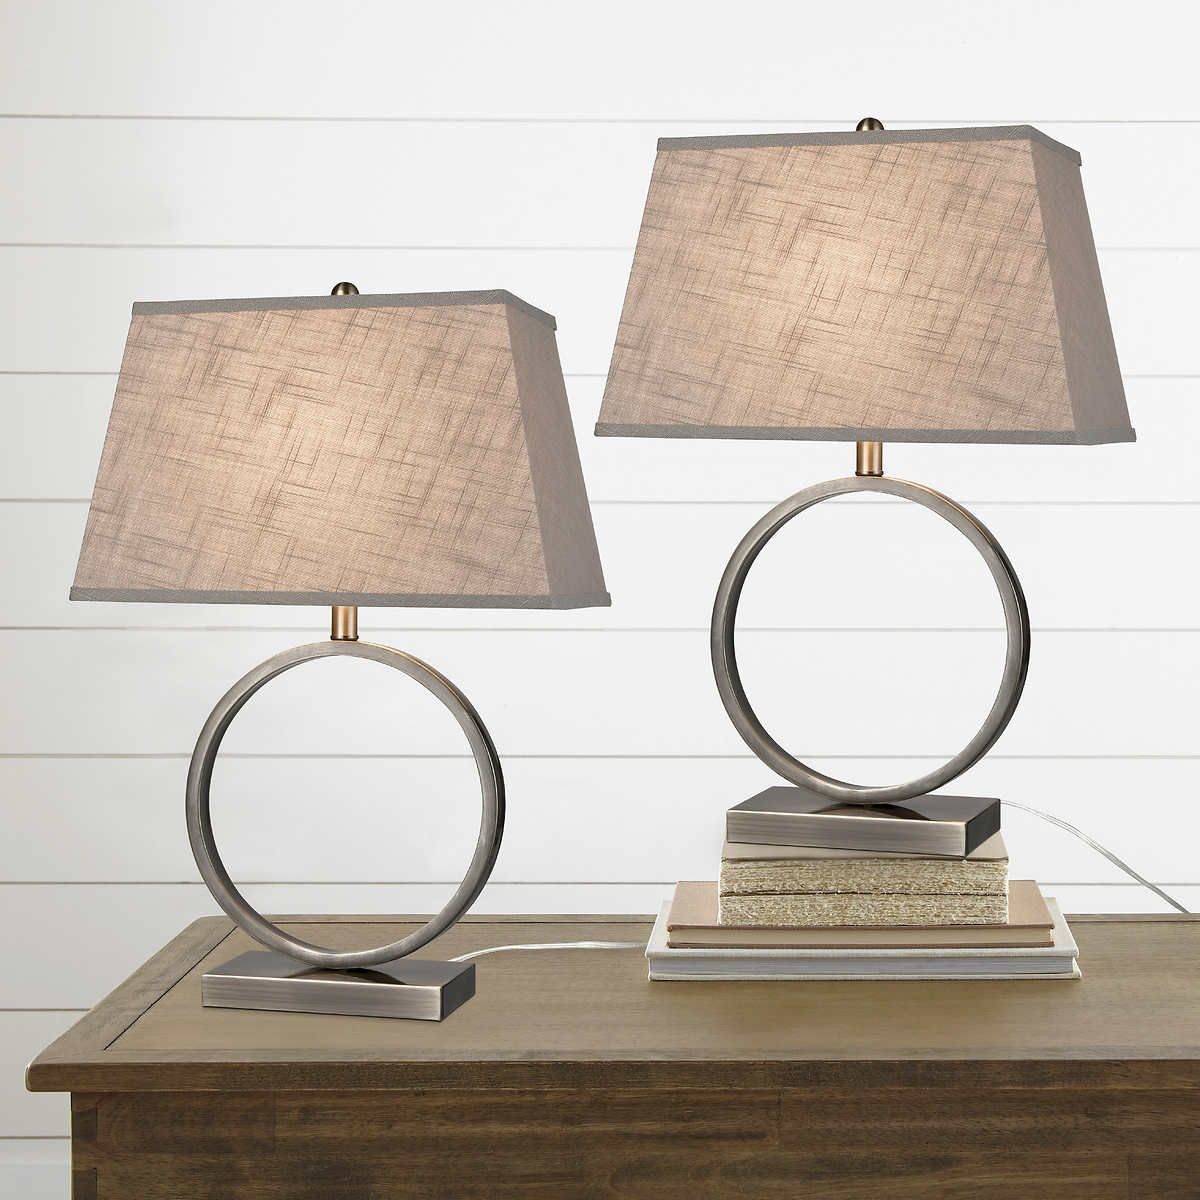 Halo Metal Table Lamp, 2pack in 2019 Metal table lamps